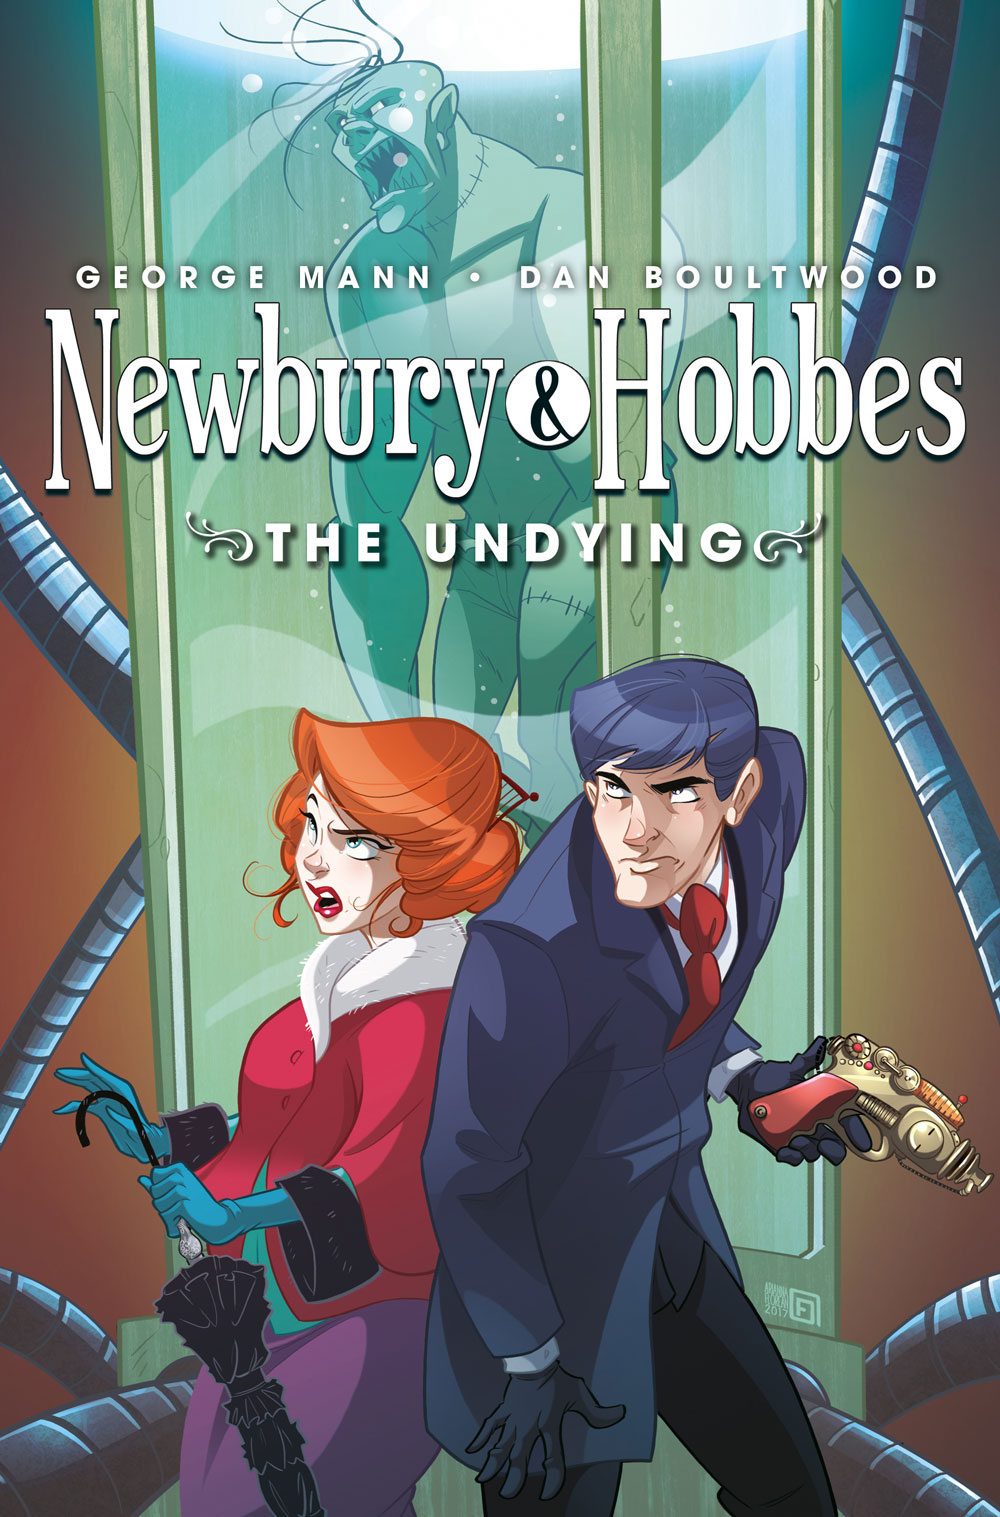 Newbury_&_Hobbes_01_CoverB.jpg